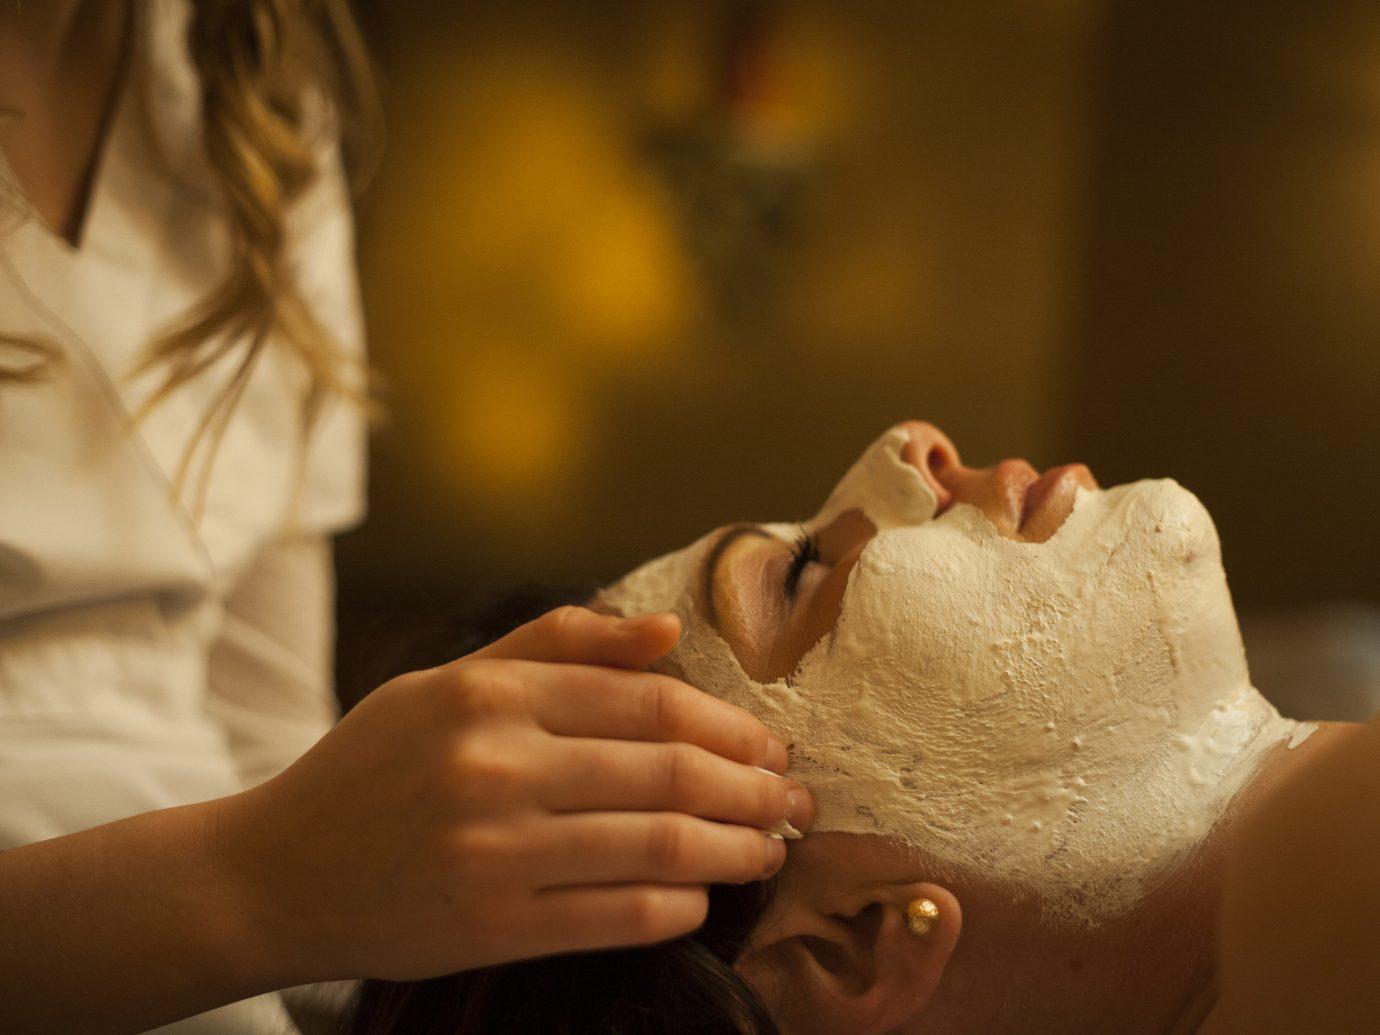 Health + Wellness Spa Retreats Trip Ideas person indoor close up skin child hand sense temple bride portrait dessert